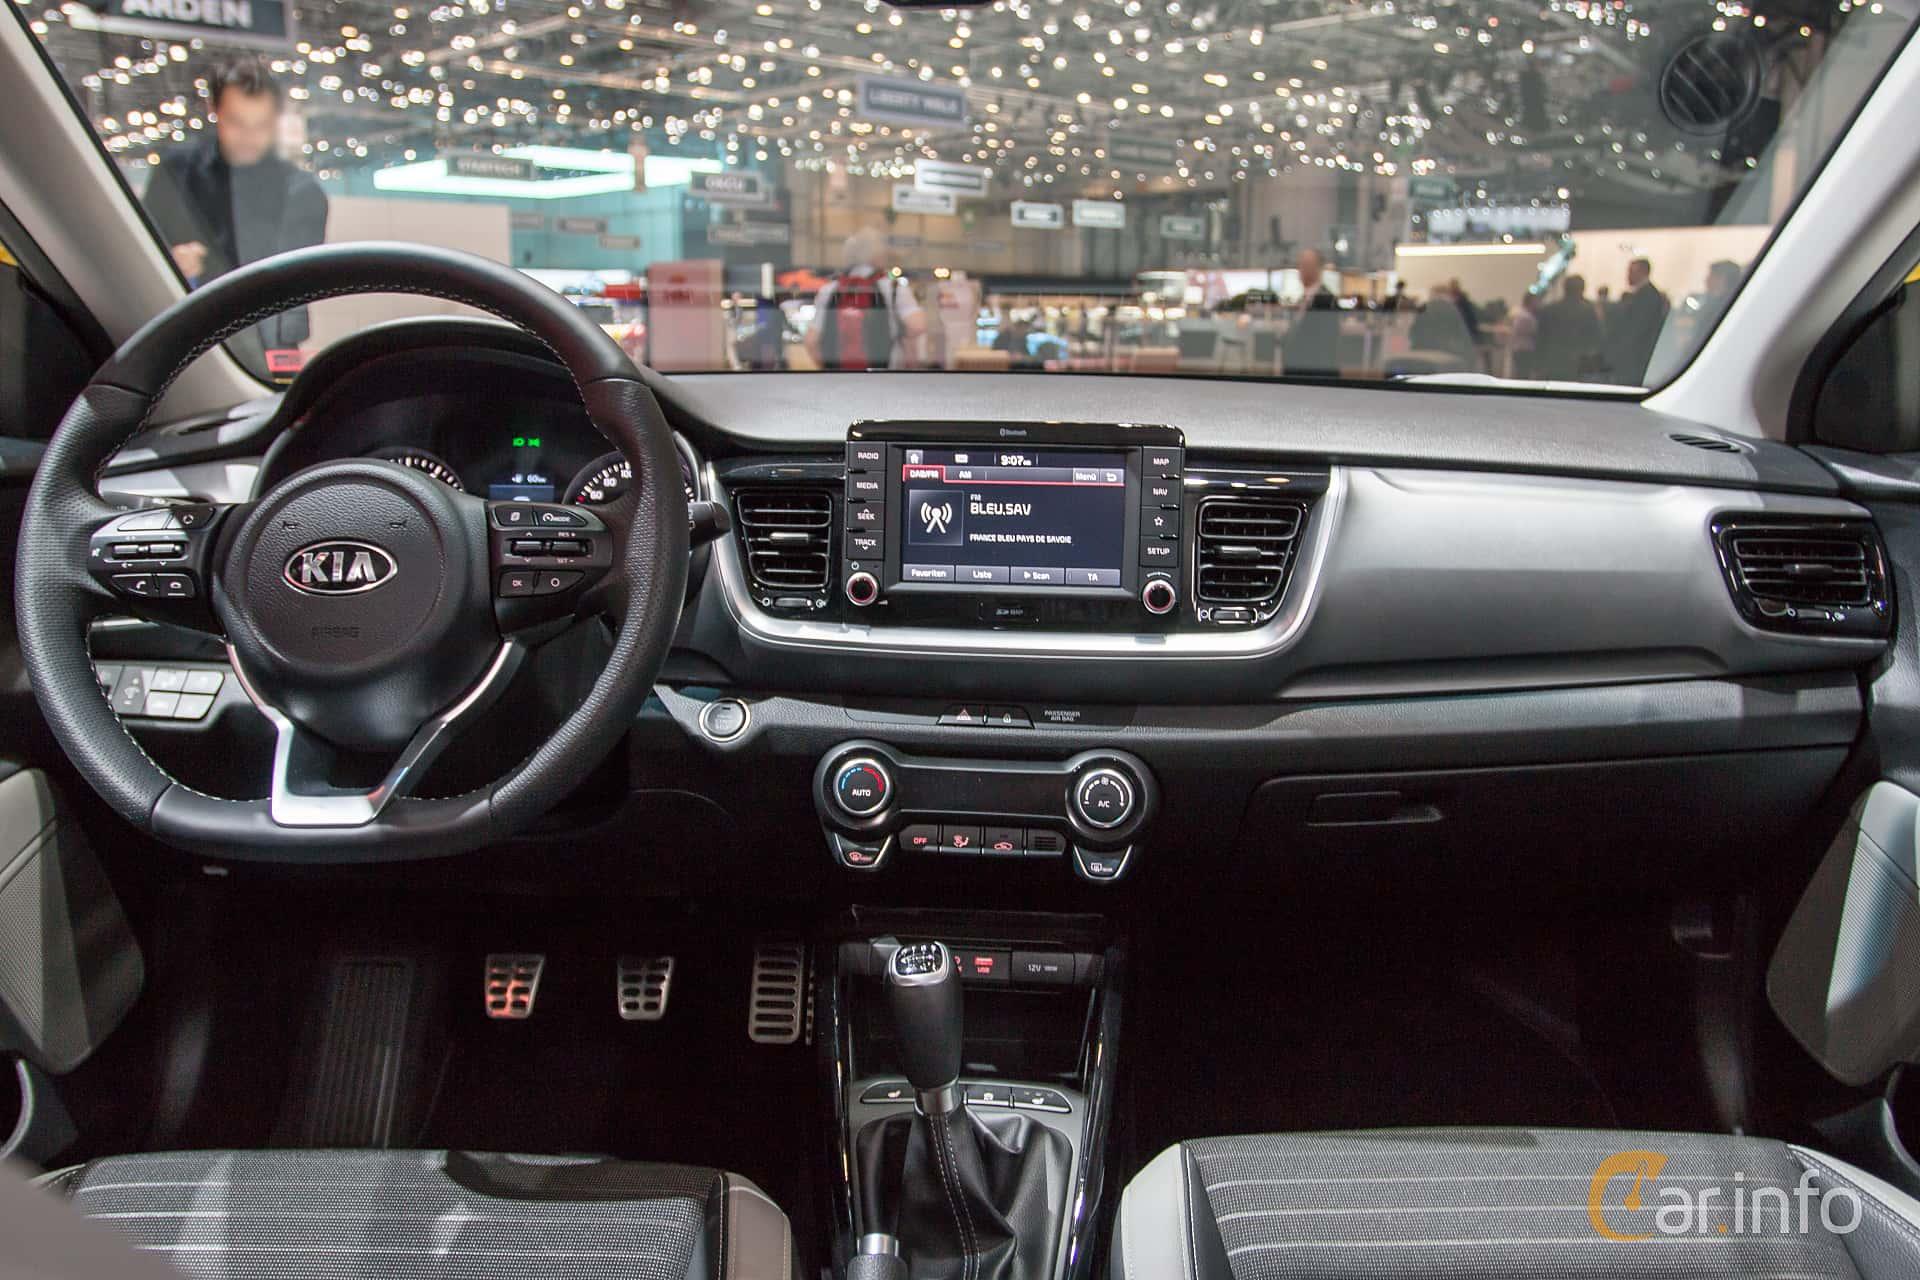 Kia Stonic 1.0 T-GDI Manual, 120hp, 2018 at Geneva Motor ...